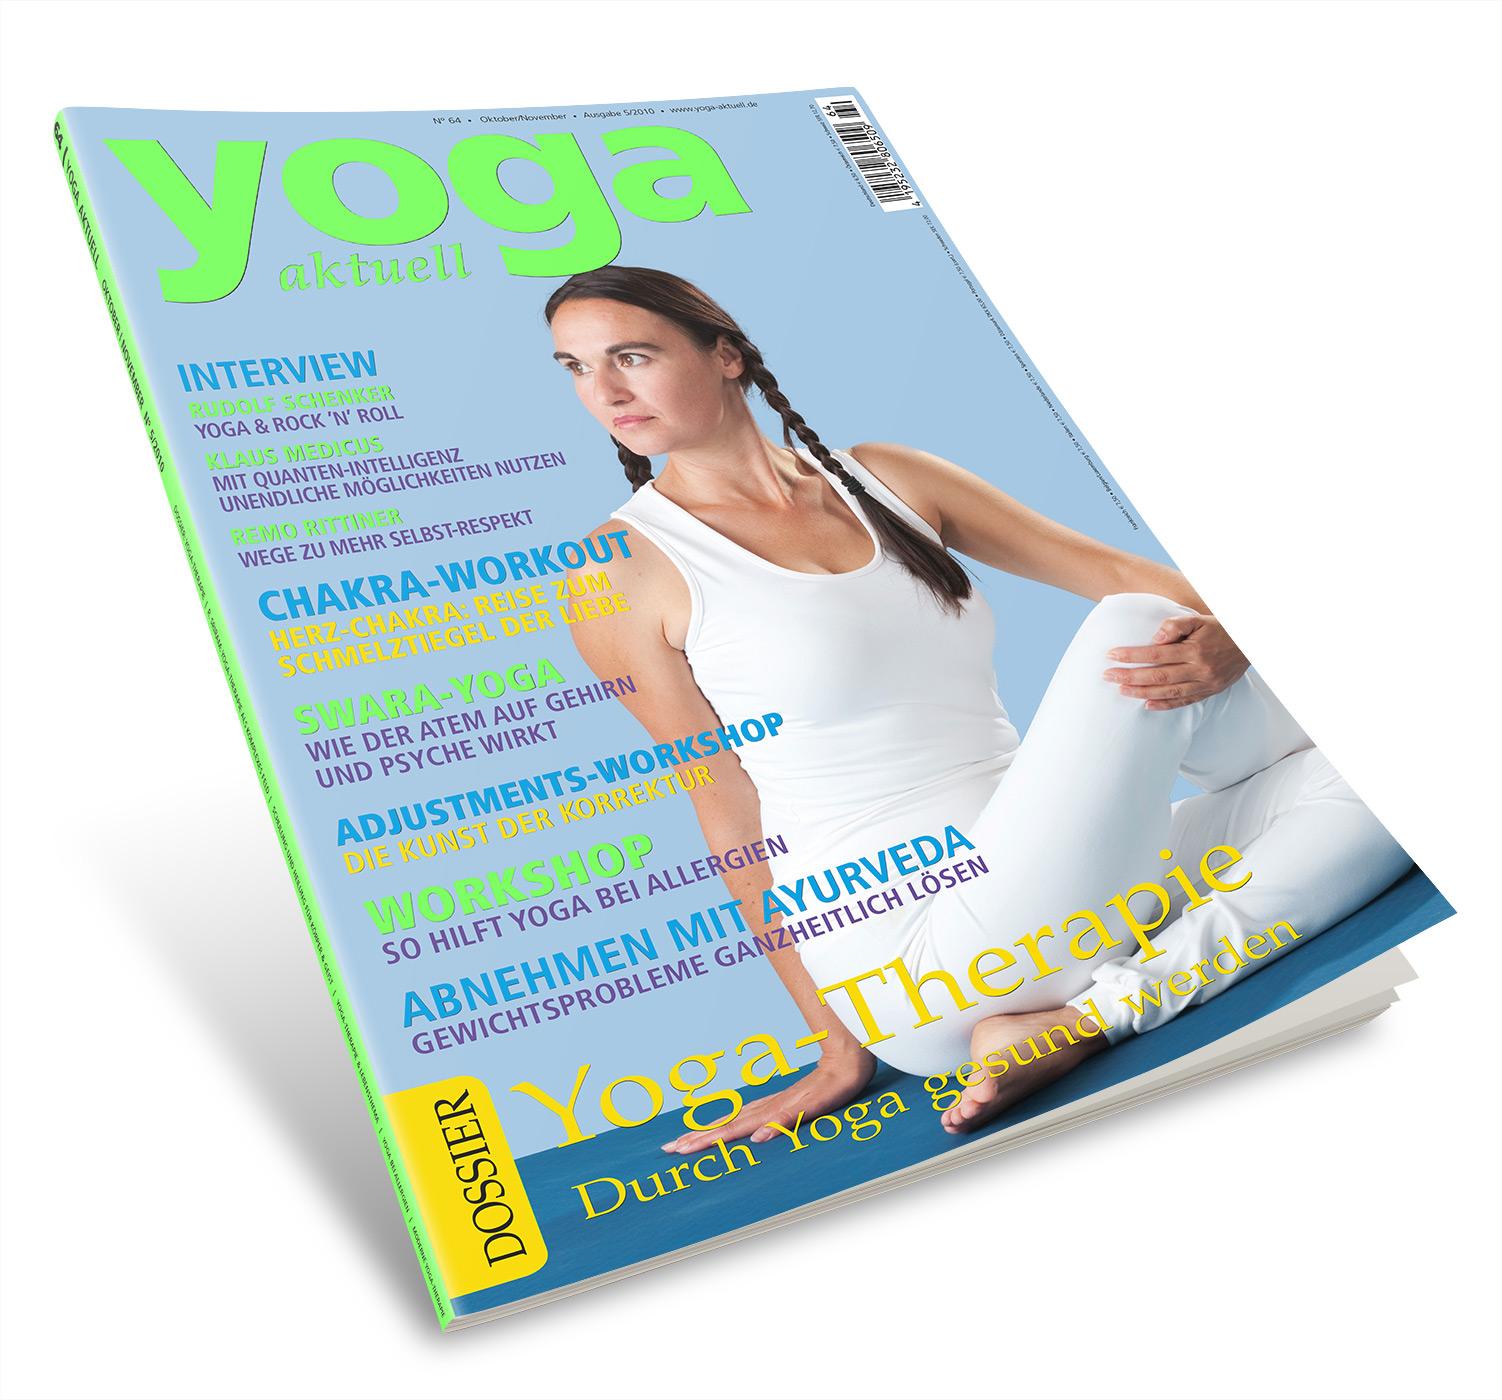 Yoga Aktuell 64 - 05/2010